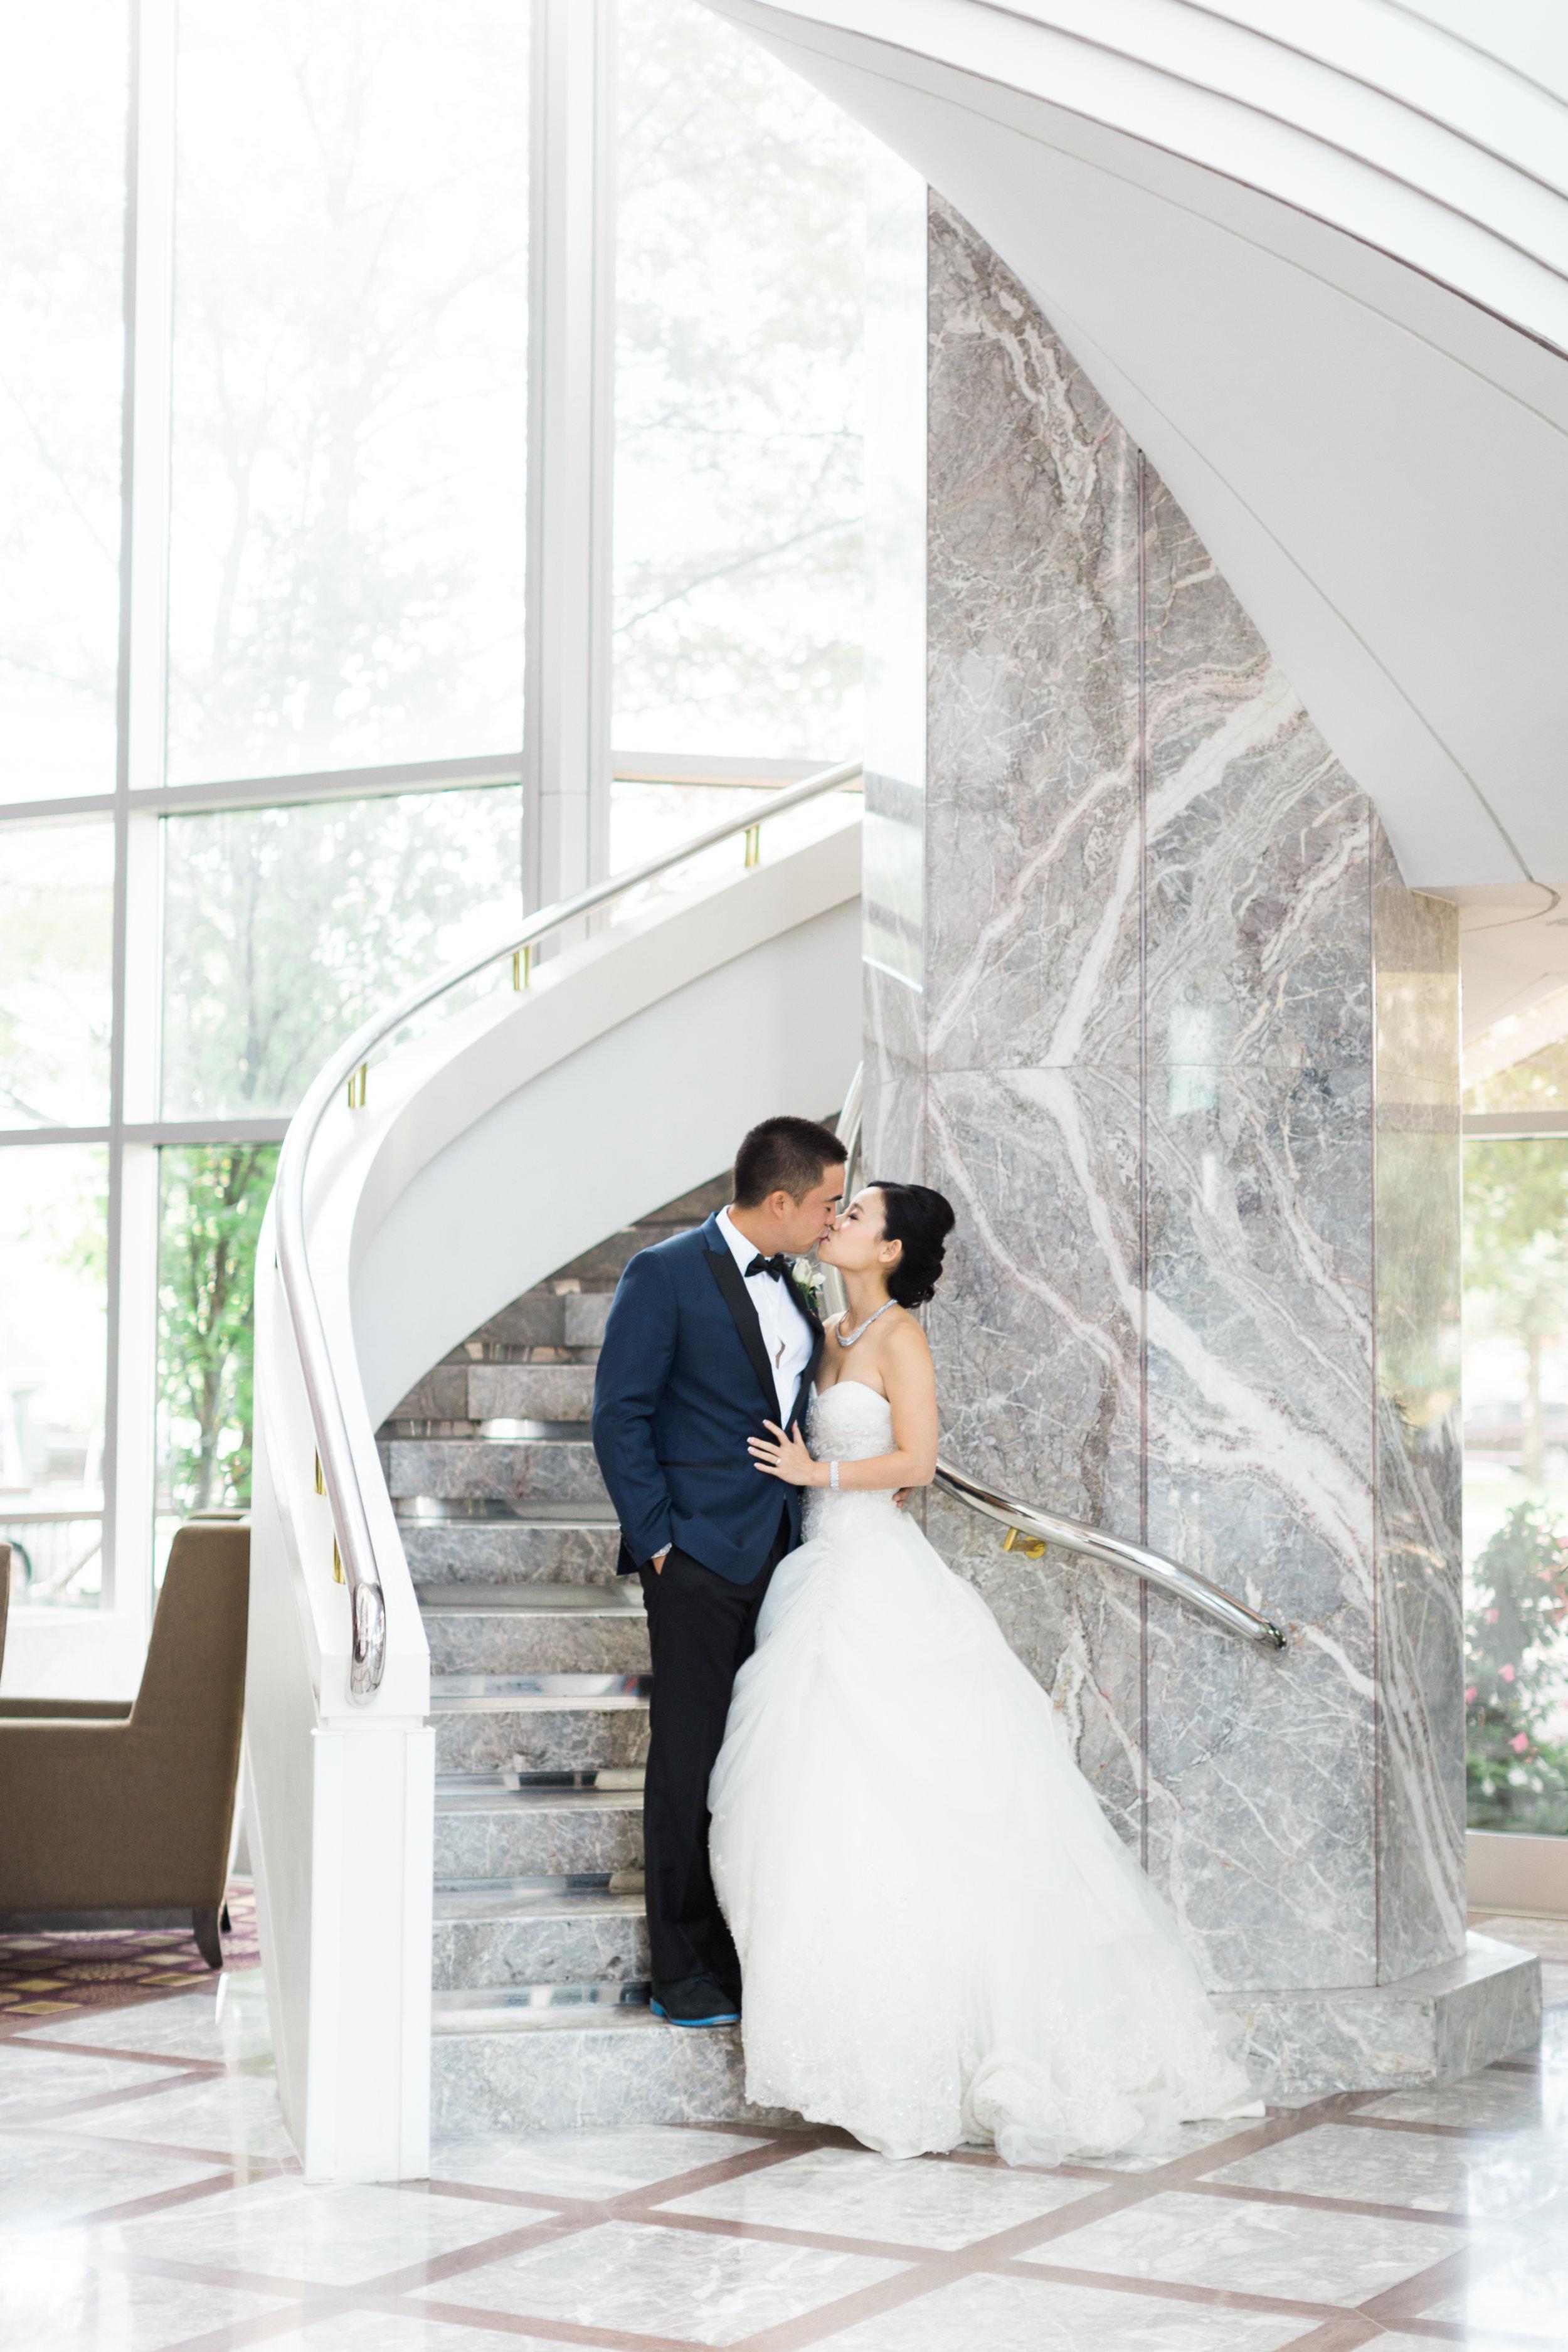 Toronto Fine Art Photographer - Hilton Markham Wedding - First Look-19.jpg